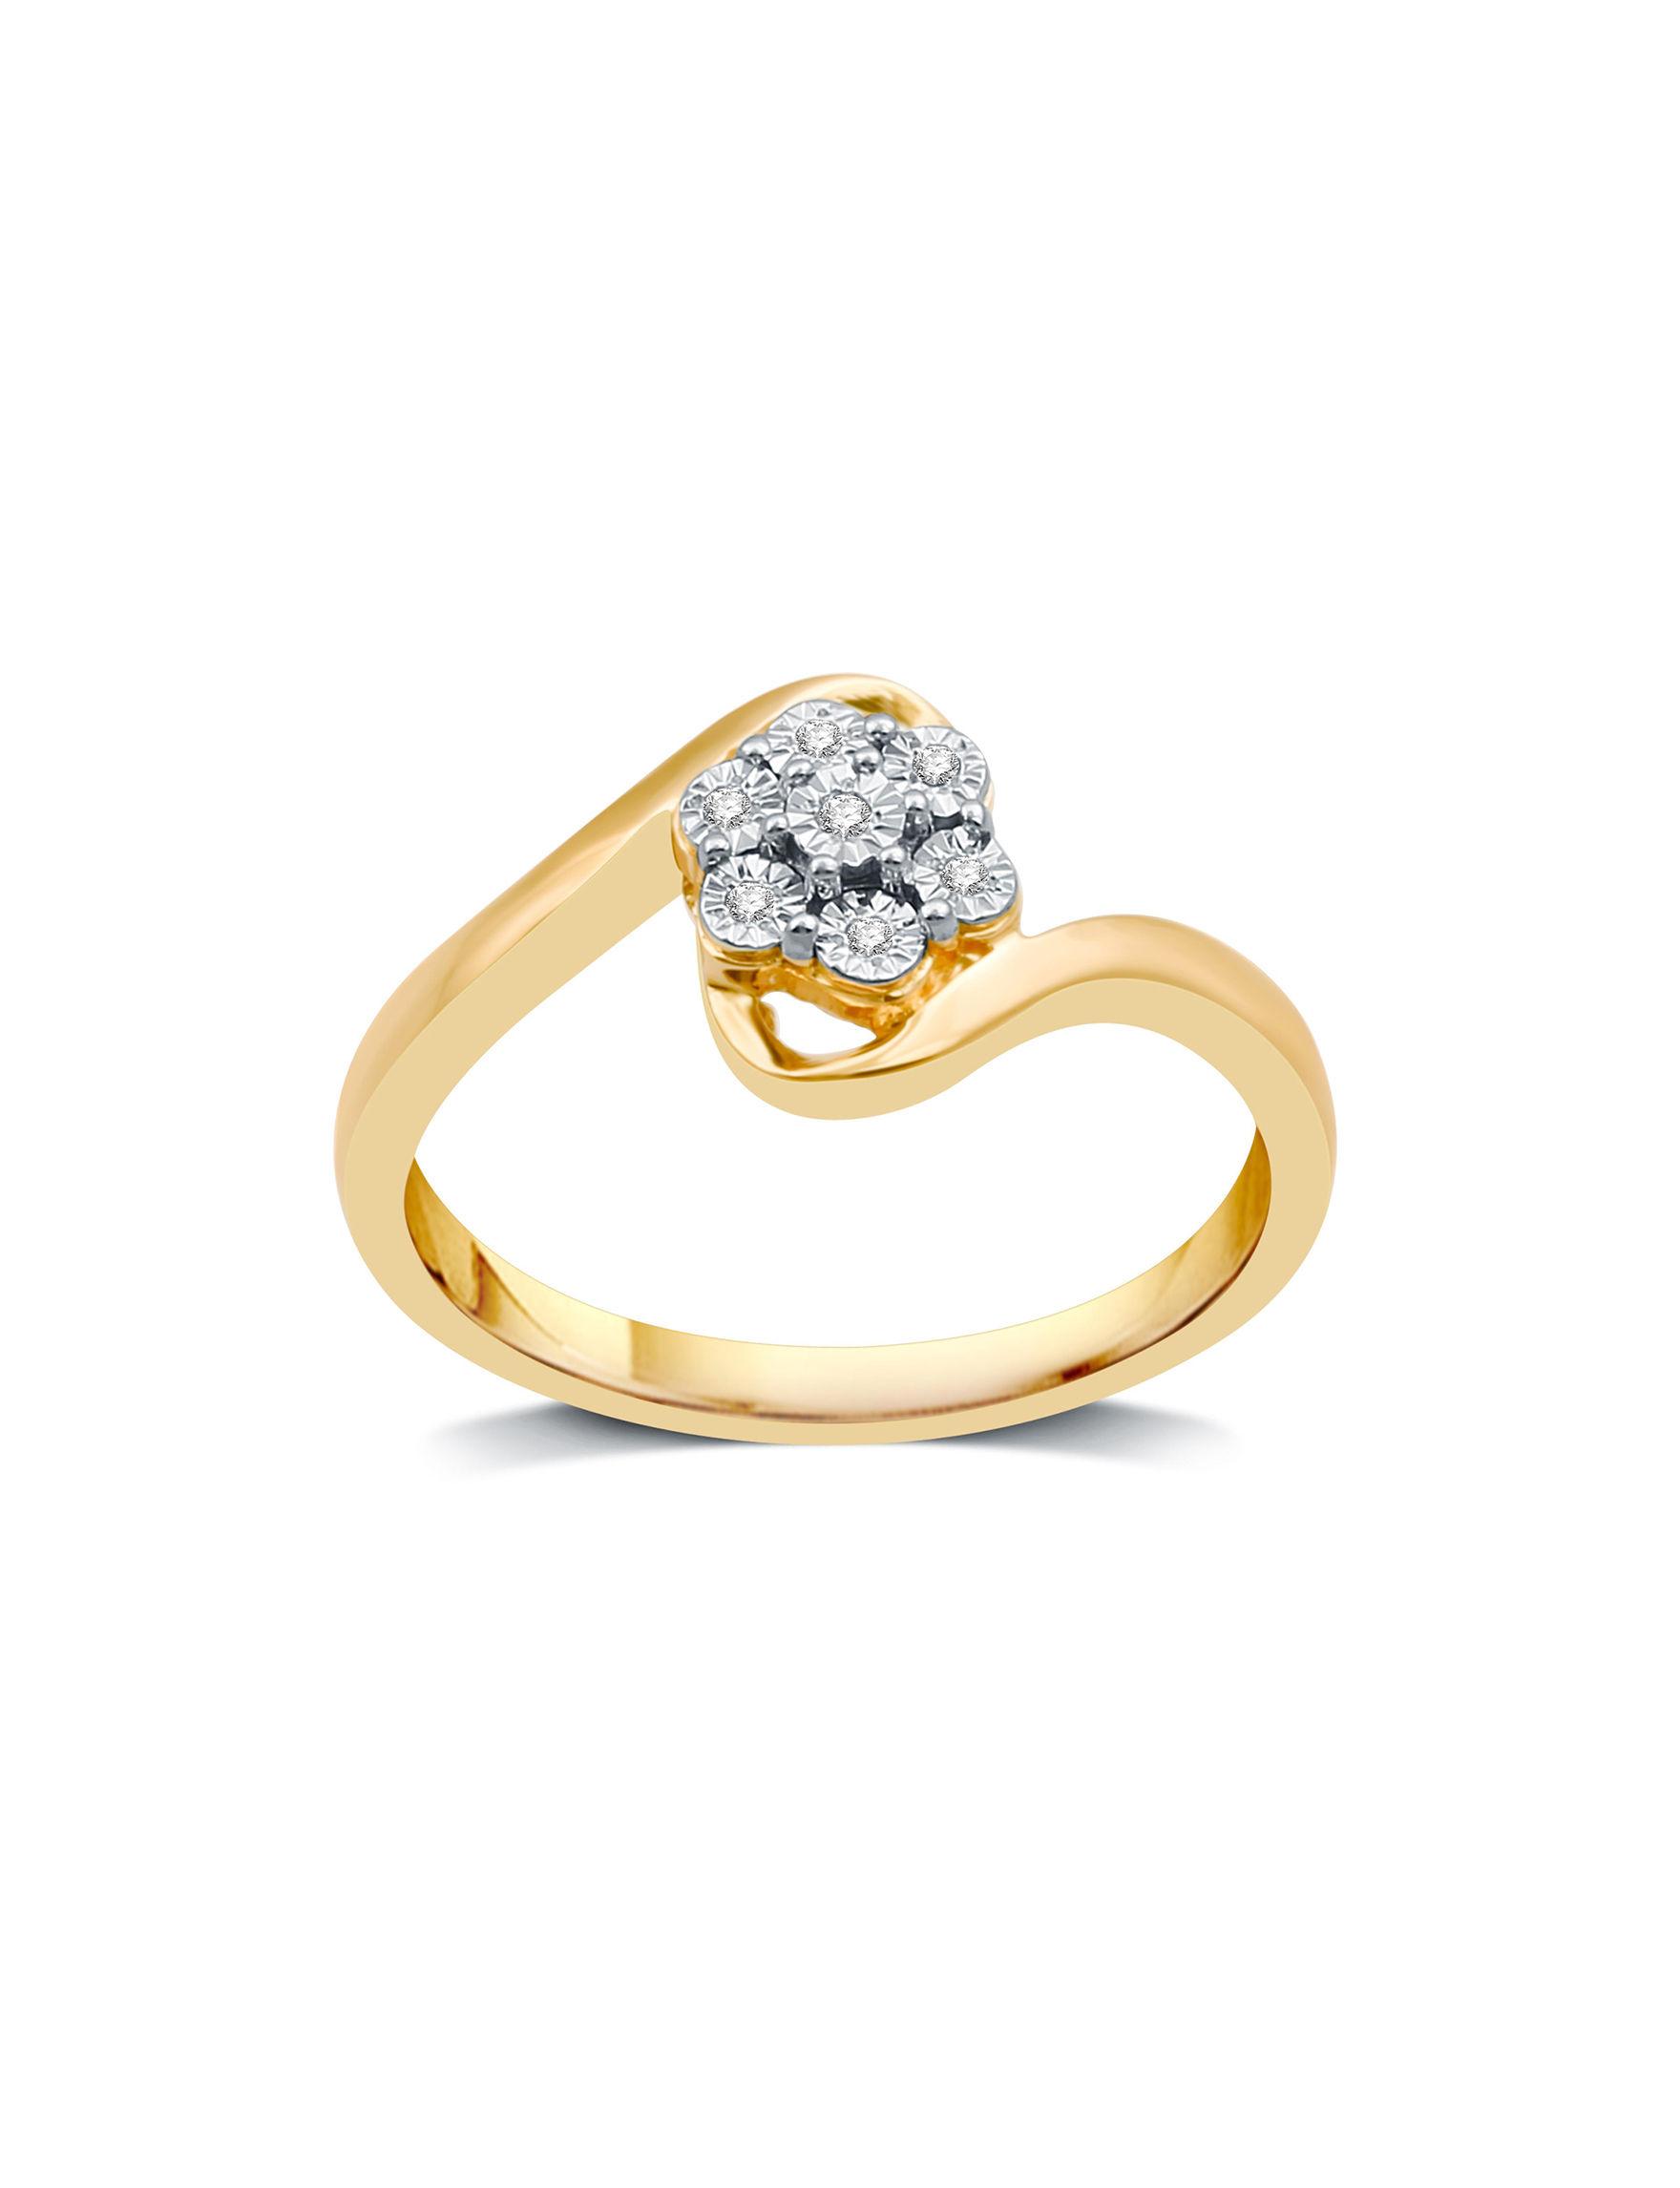 DeCarat Gold Rings Fine Jewelry